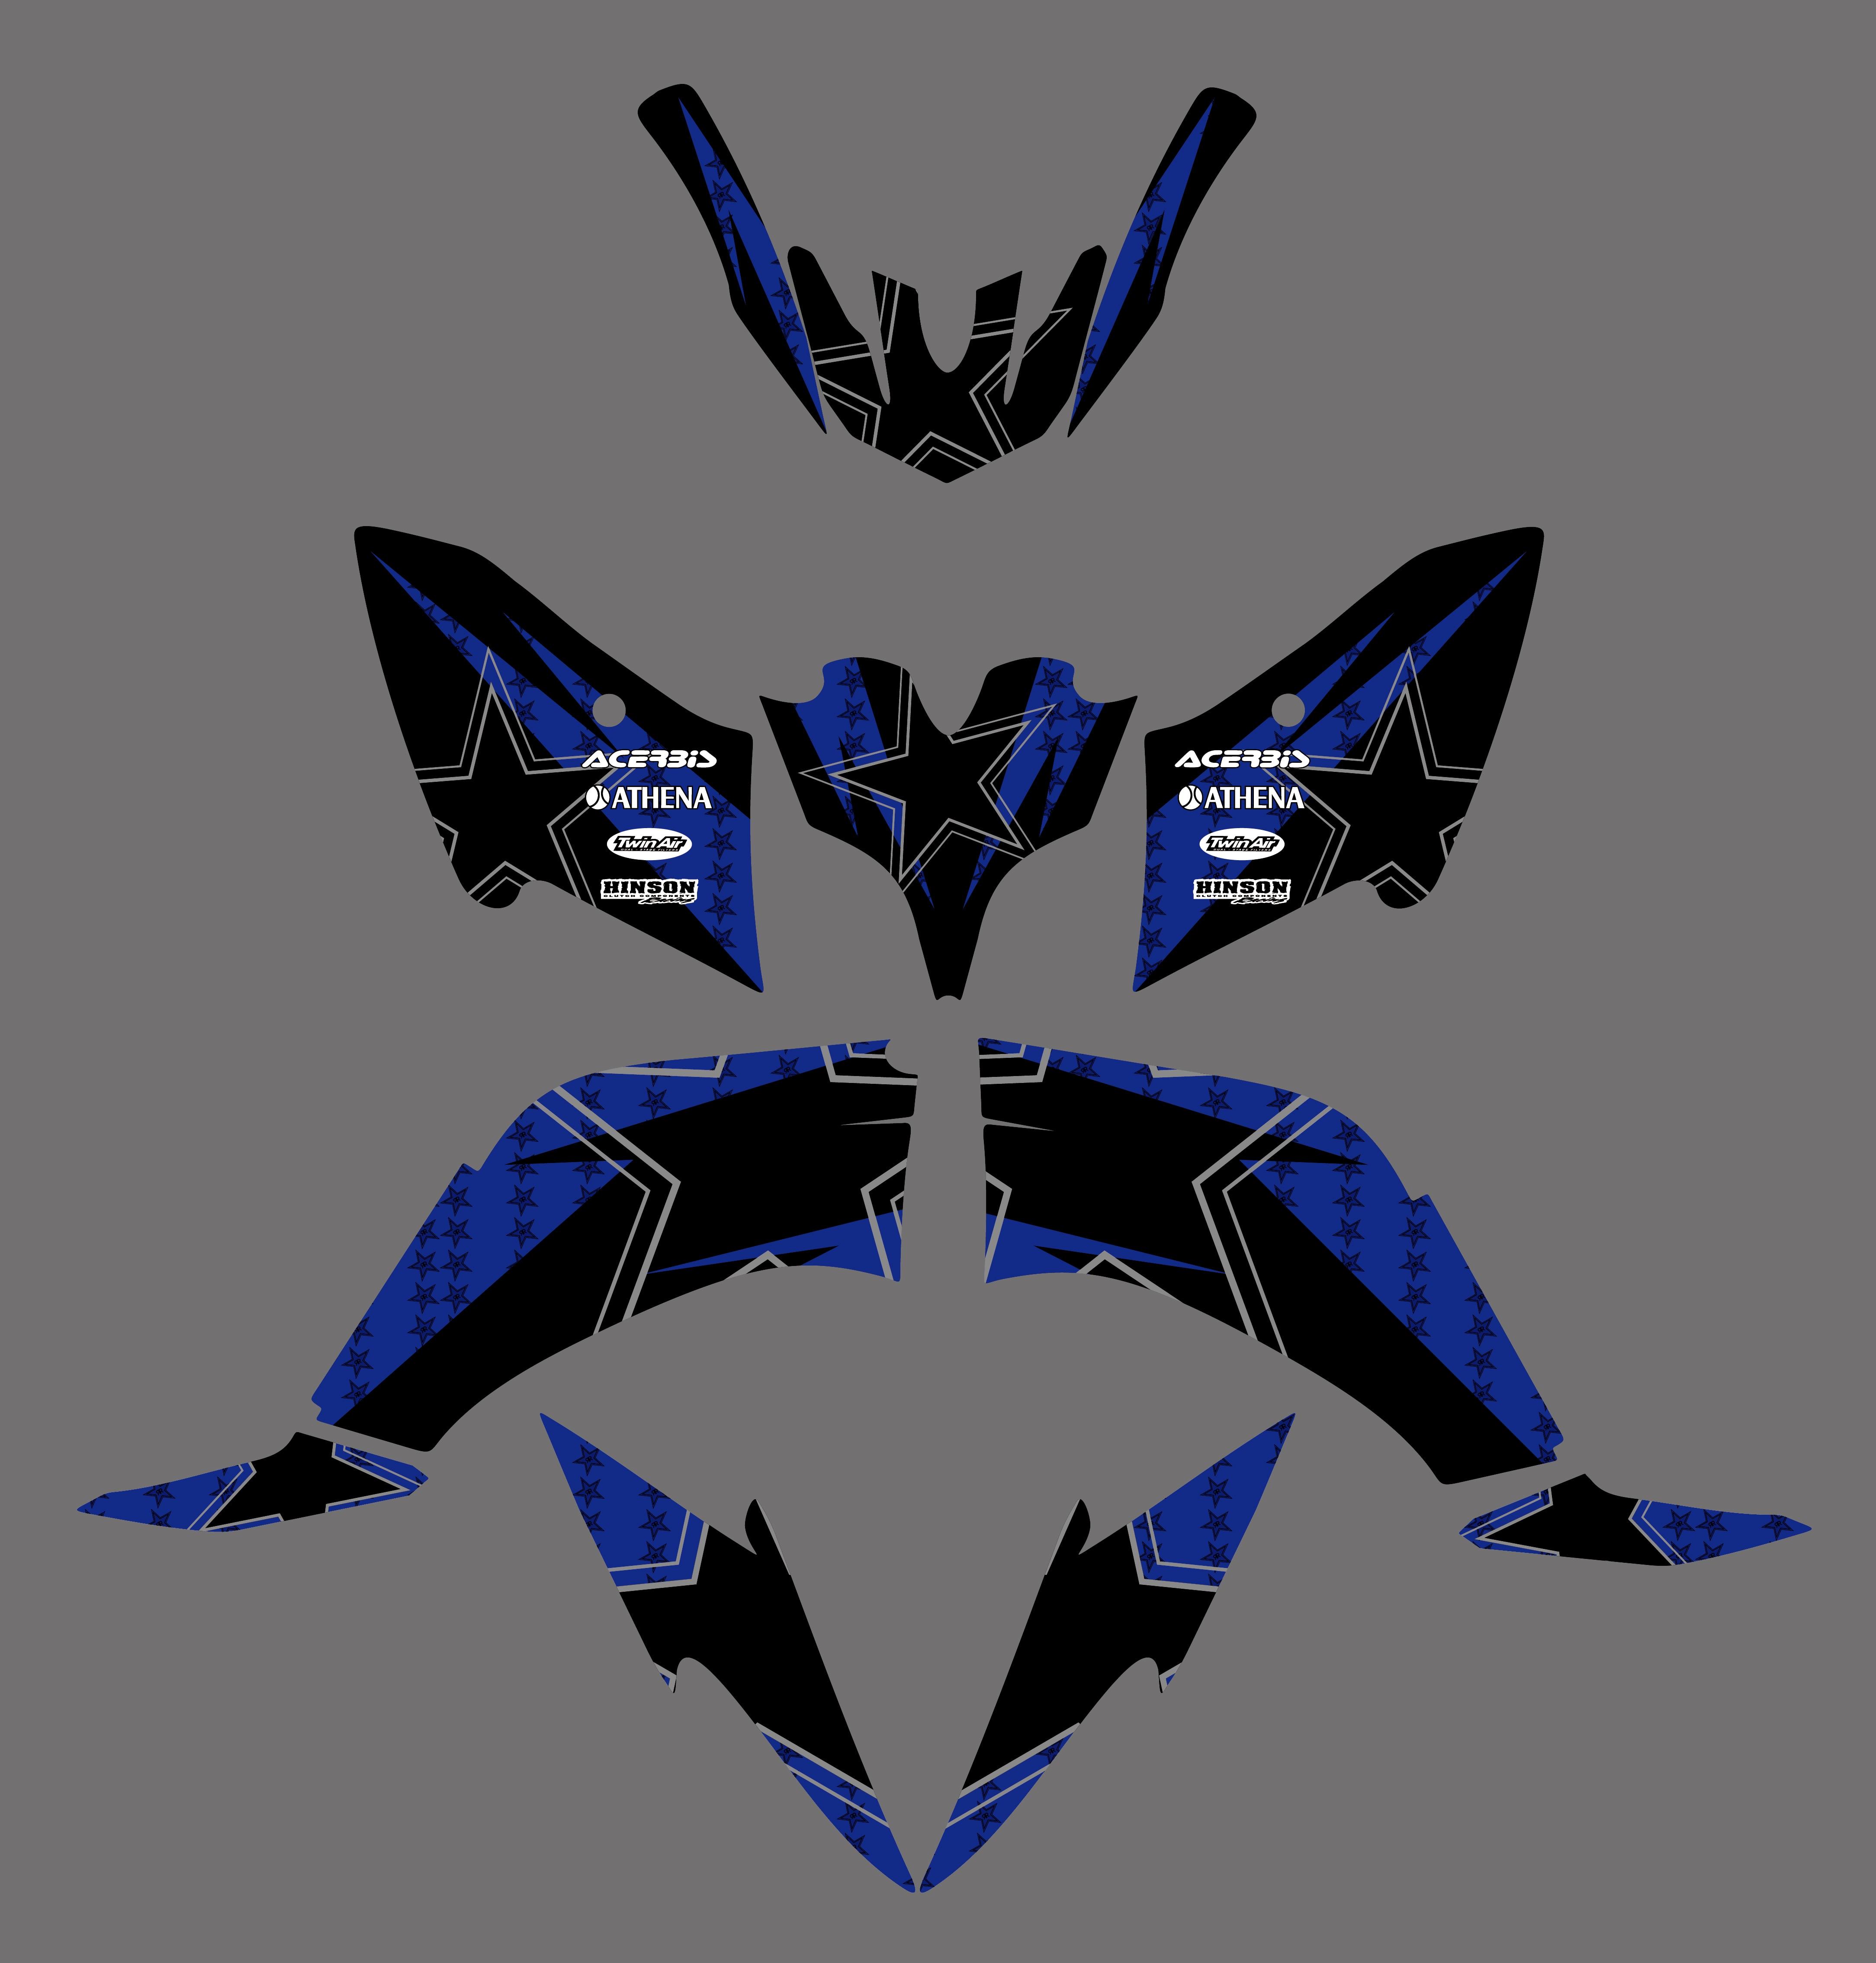 New Style Stars DECALS STICKERS Graphics Kits FIT For Yamaha Raptor125 Raptor 250 YFM125 YFM250 ATV YFM 125 250